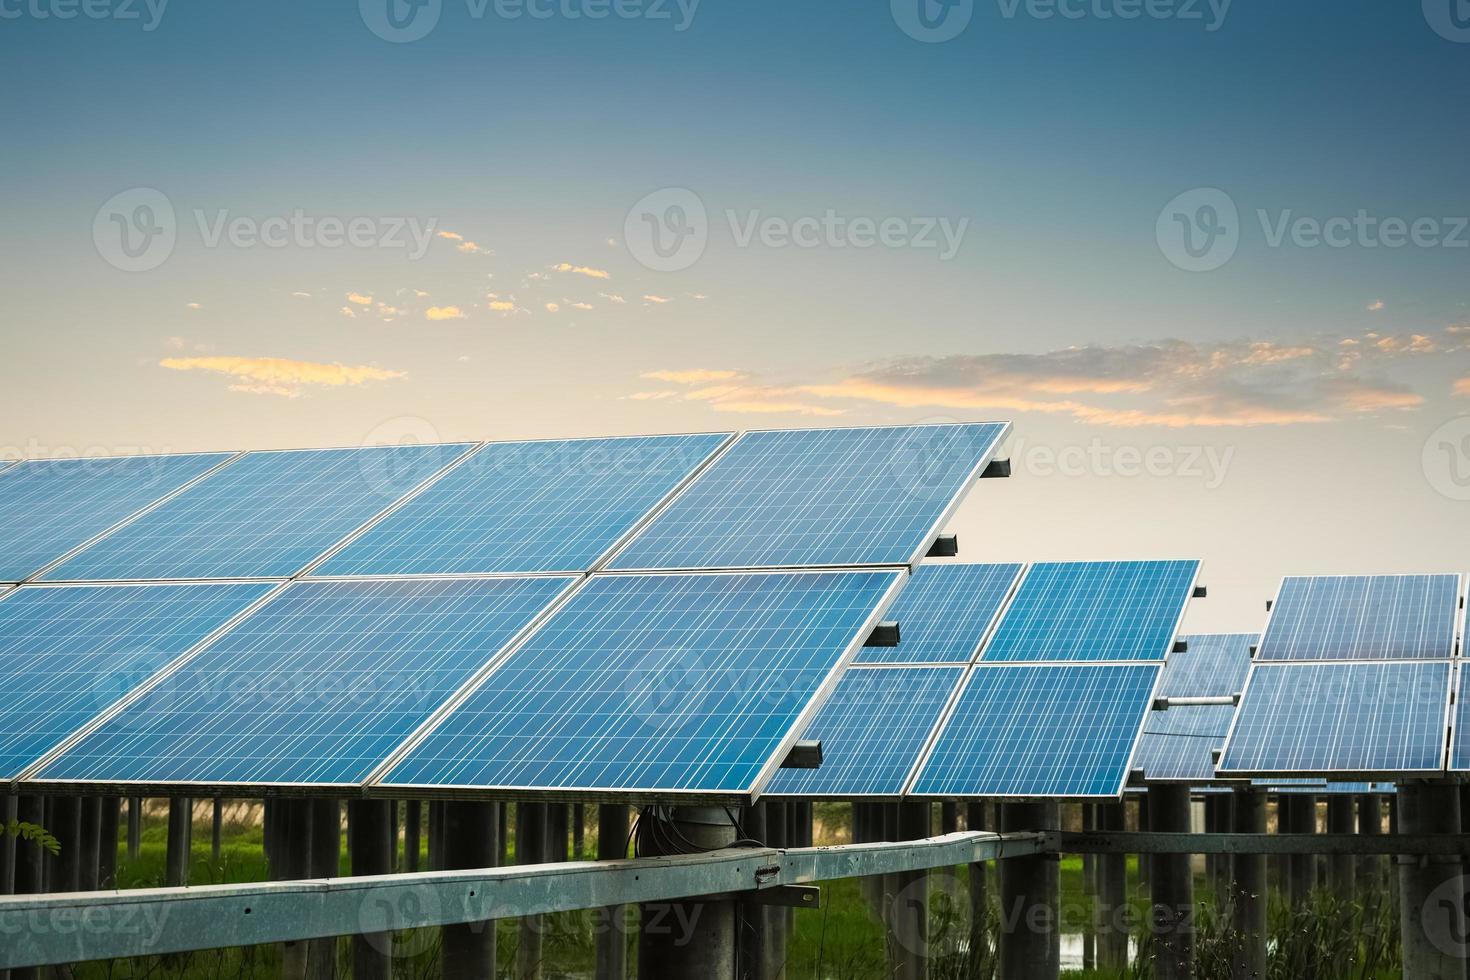 Solarpark in der Abenddämmerung foto